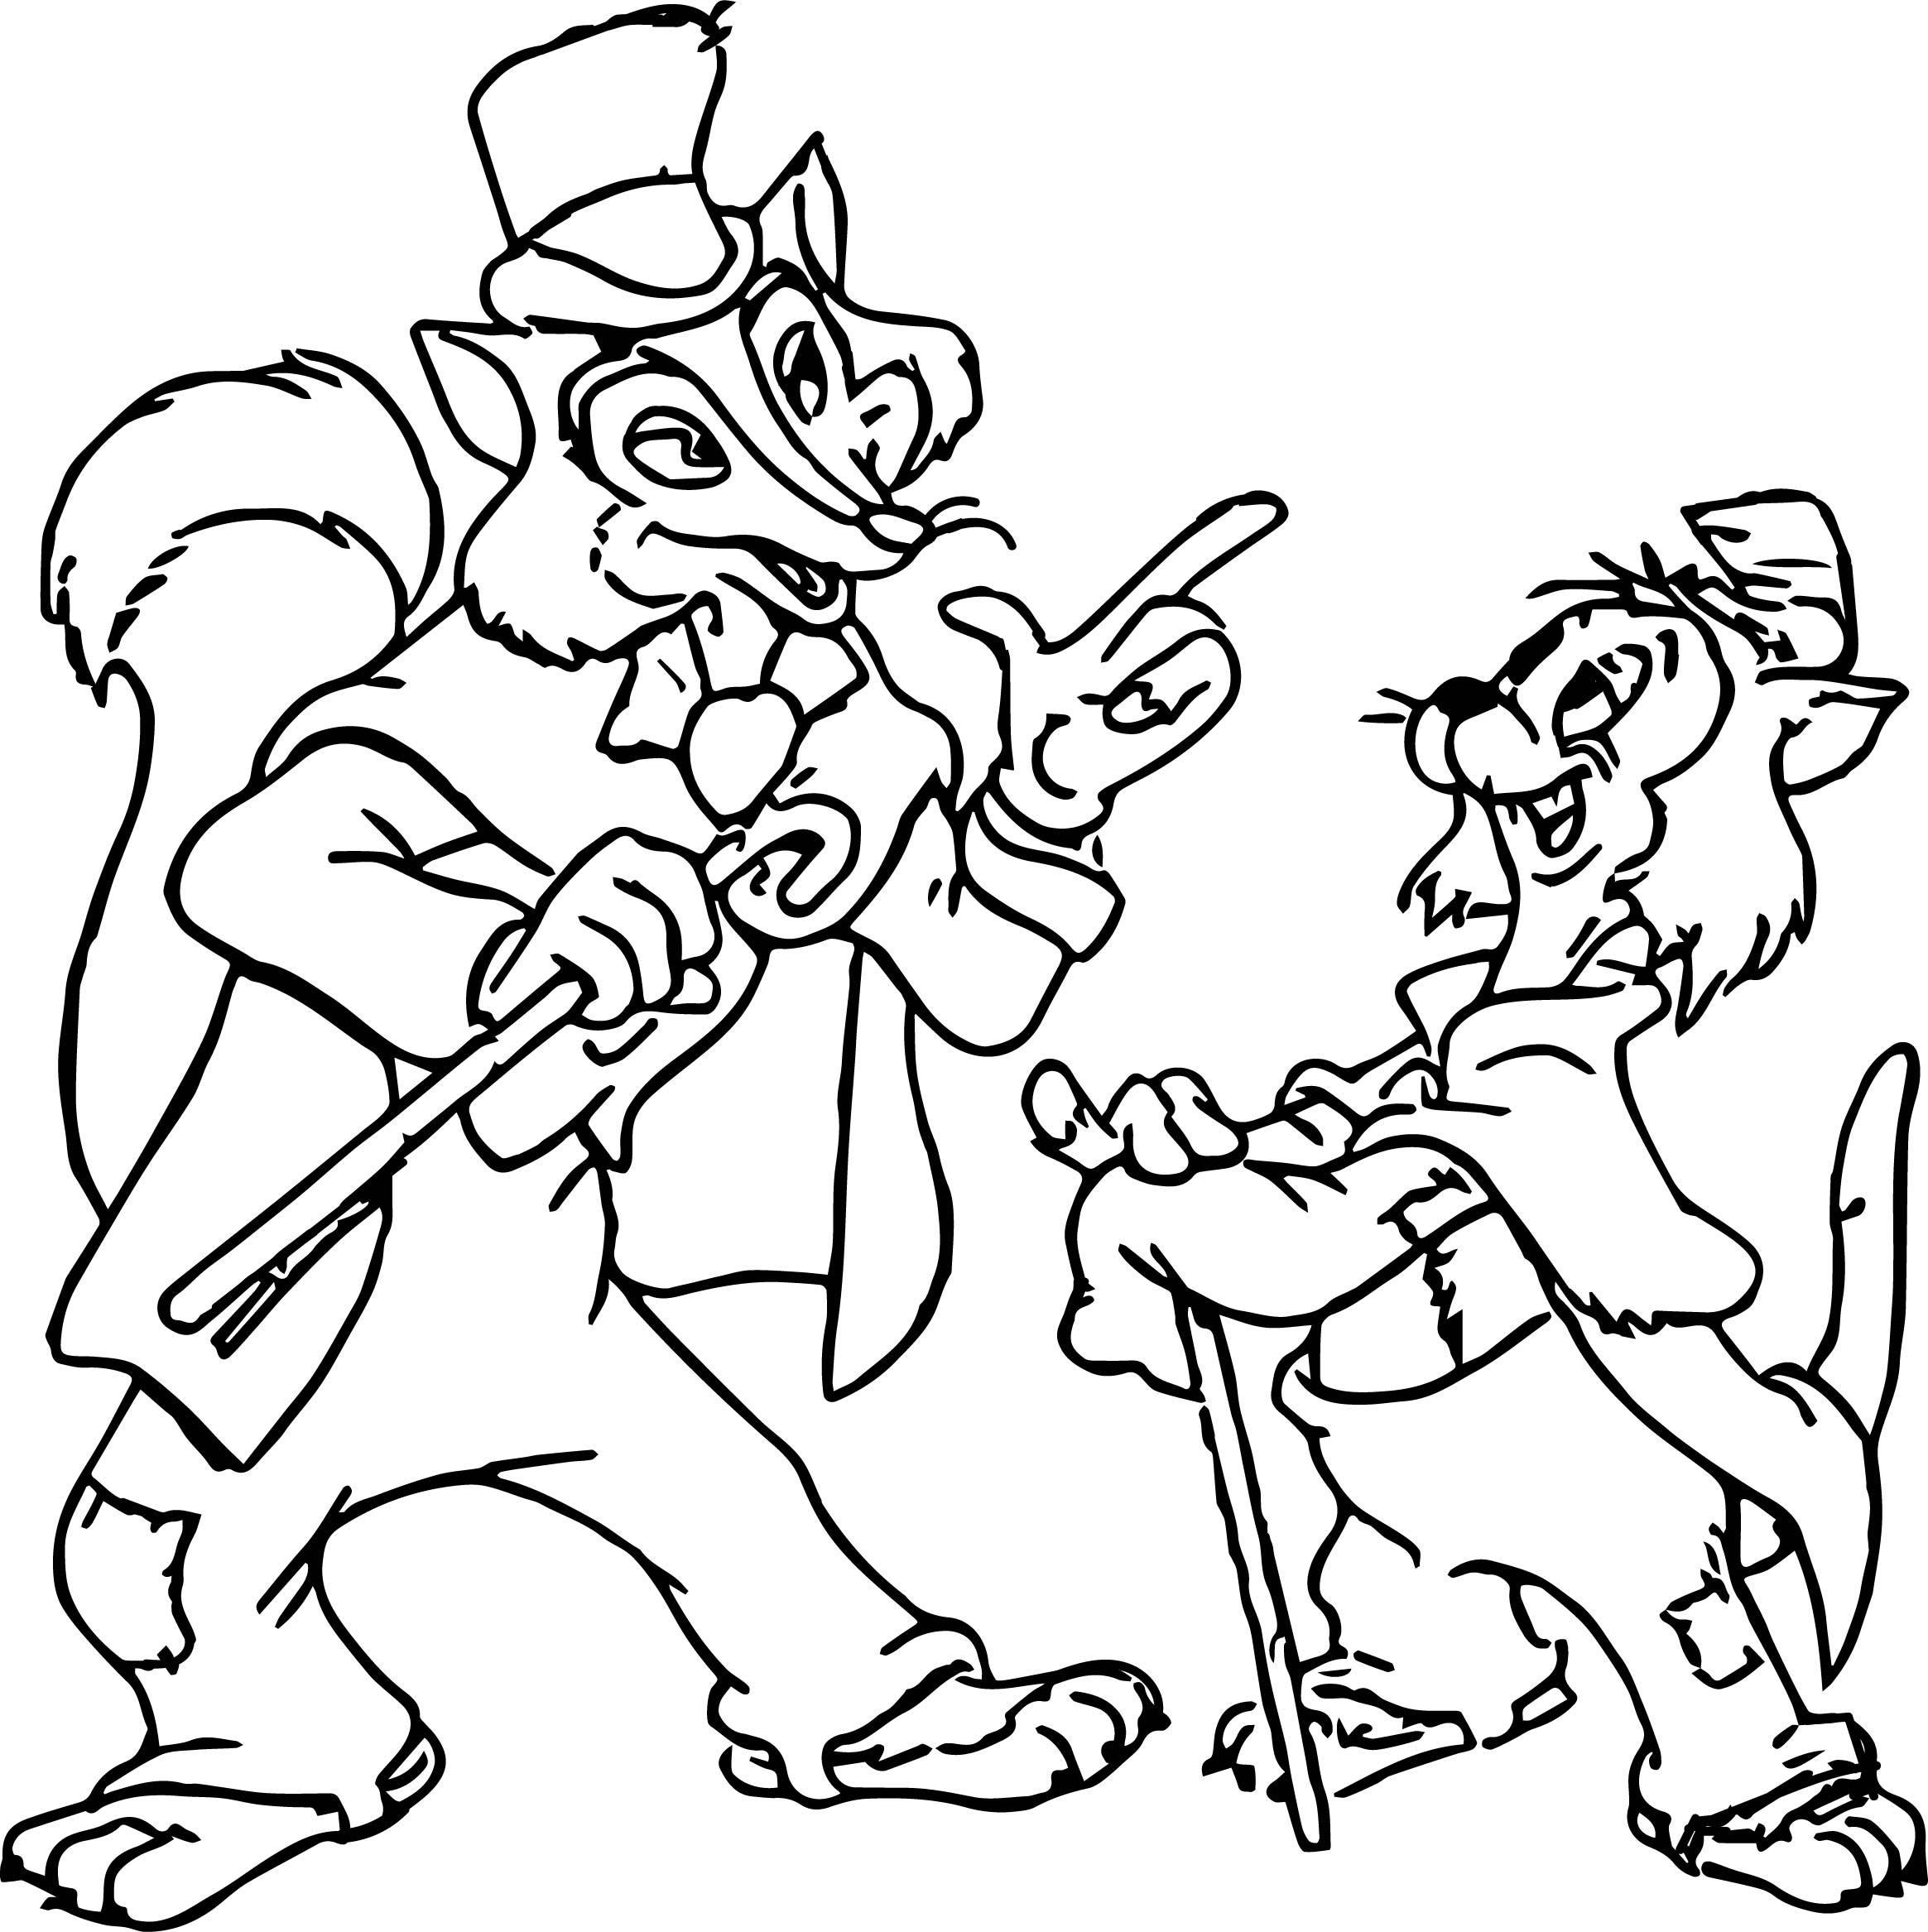 Pinocchio Villains Coloring Page